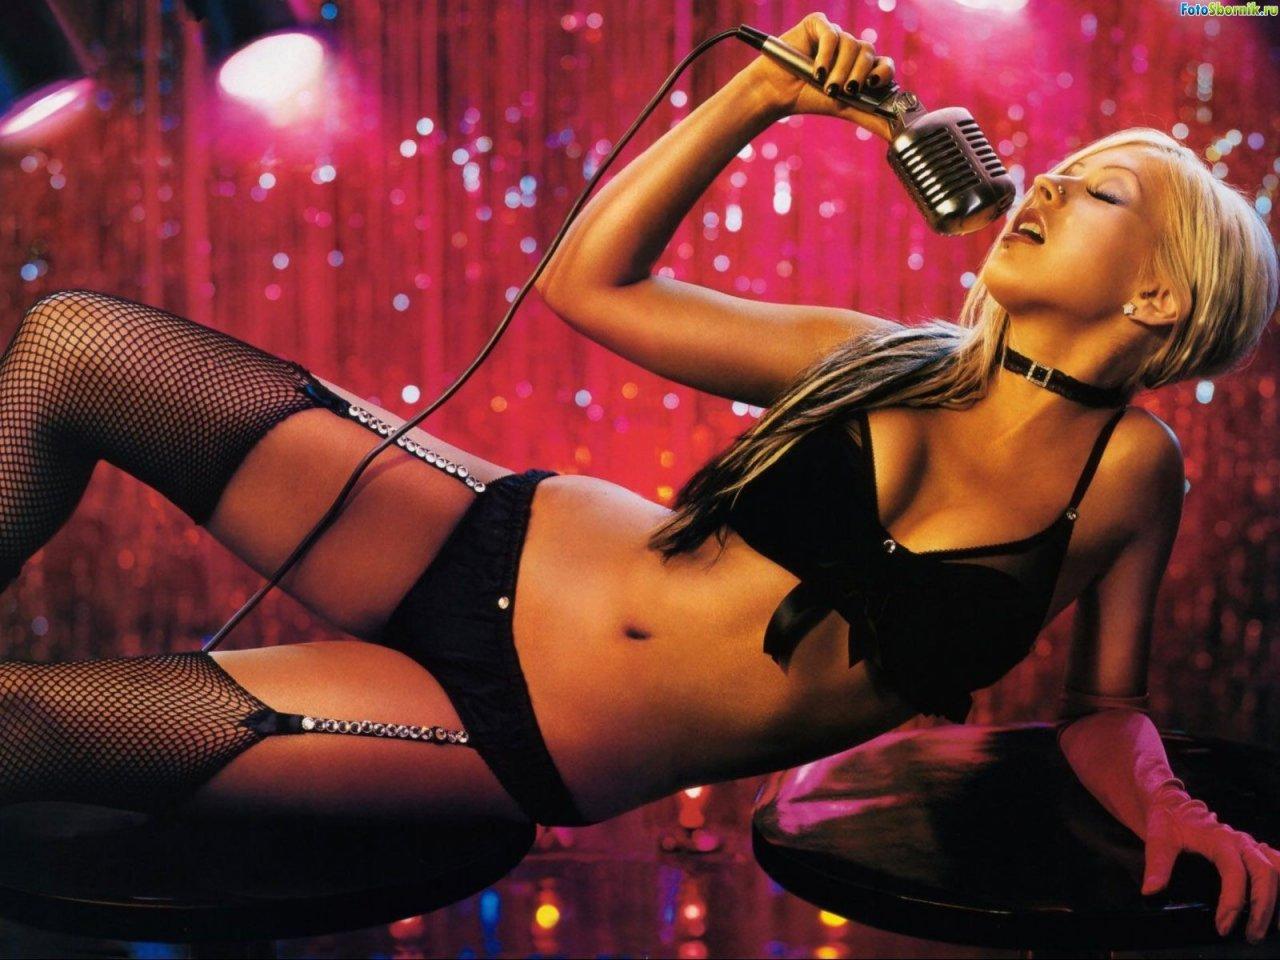 Sexy Christina